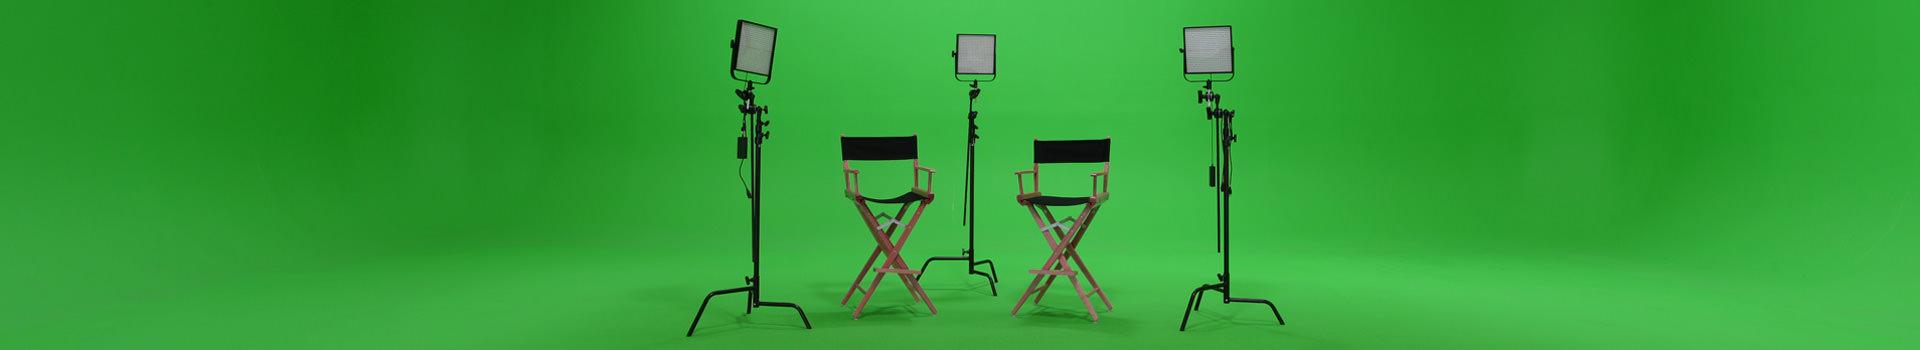 studio-green-screen-chromakey-dark